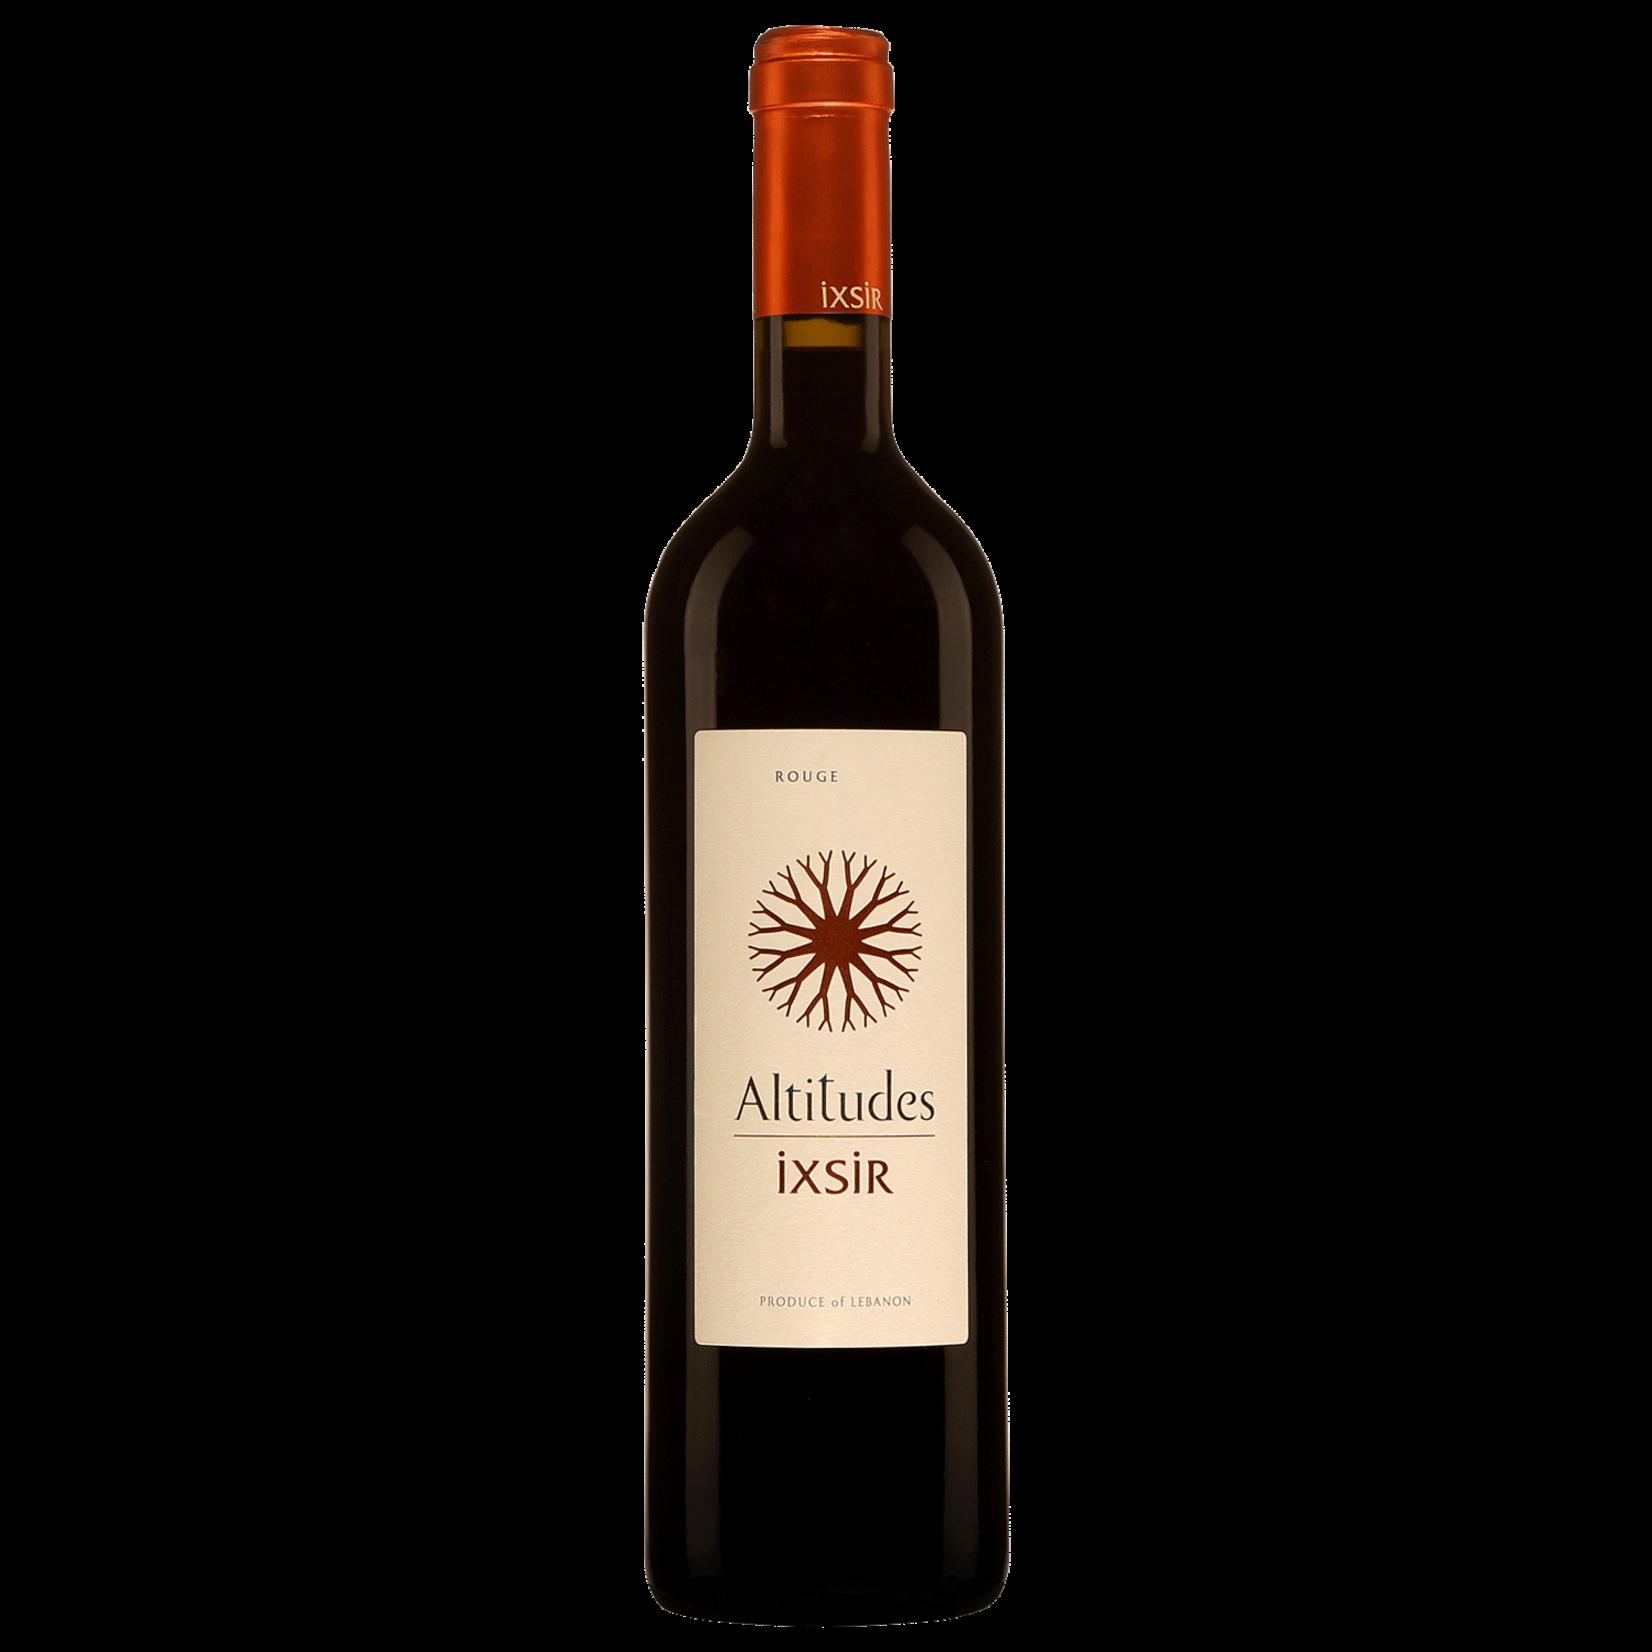 Wine Ixsir Altitudes Lebanon Red 2016